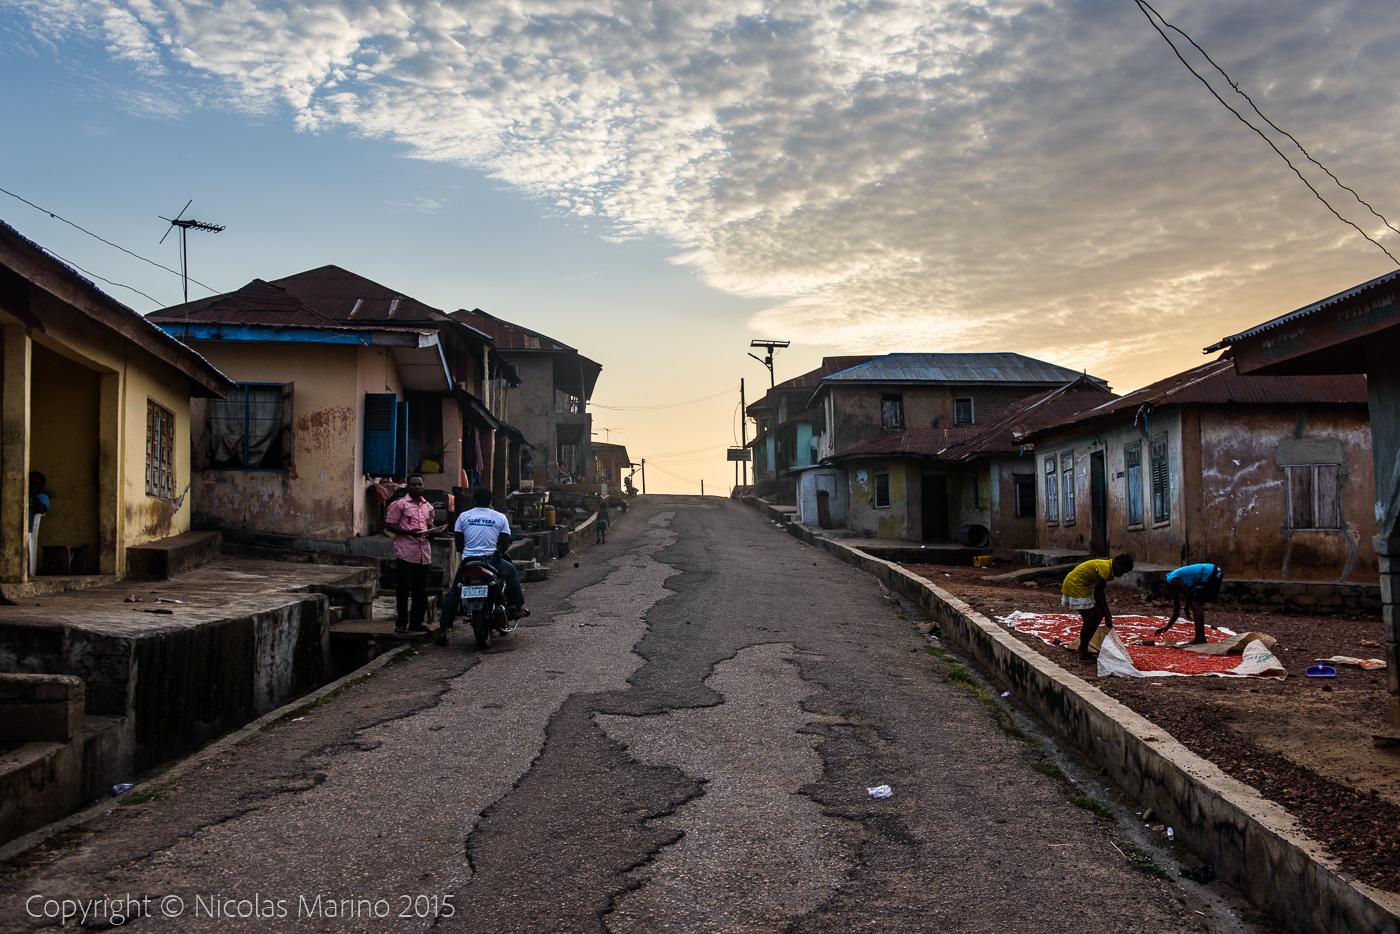 Streets of Ifon, Nigeria